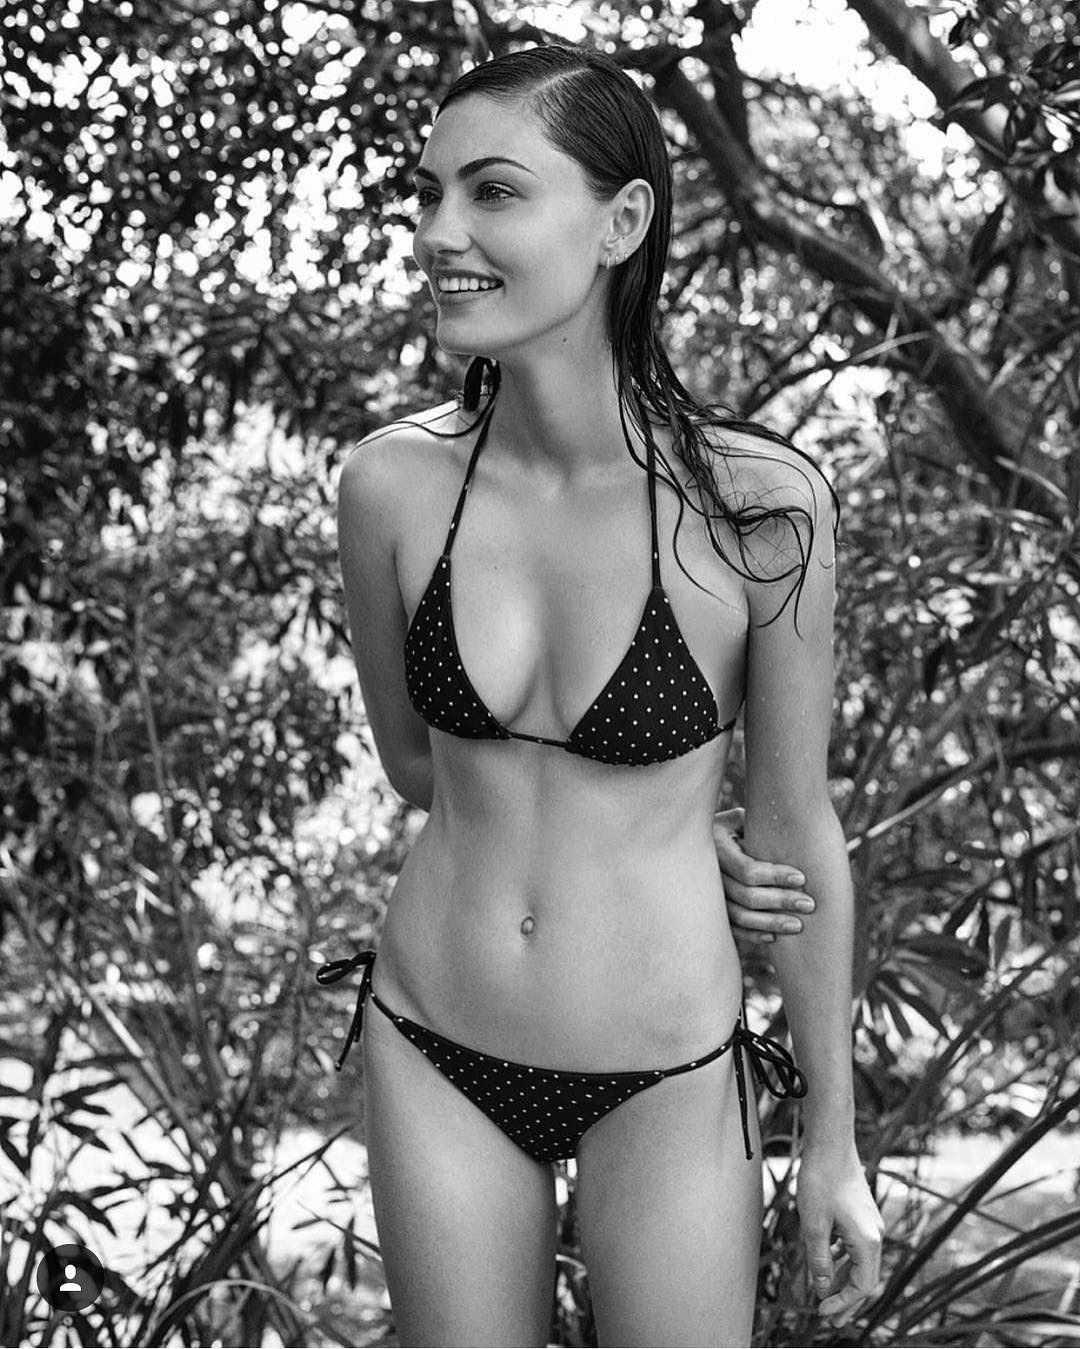 Phoebe Tonkin hot bikini pic (2)